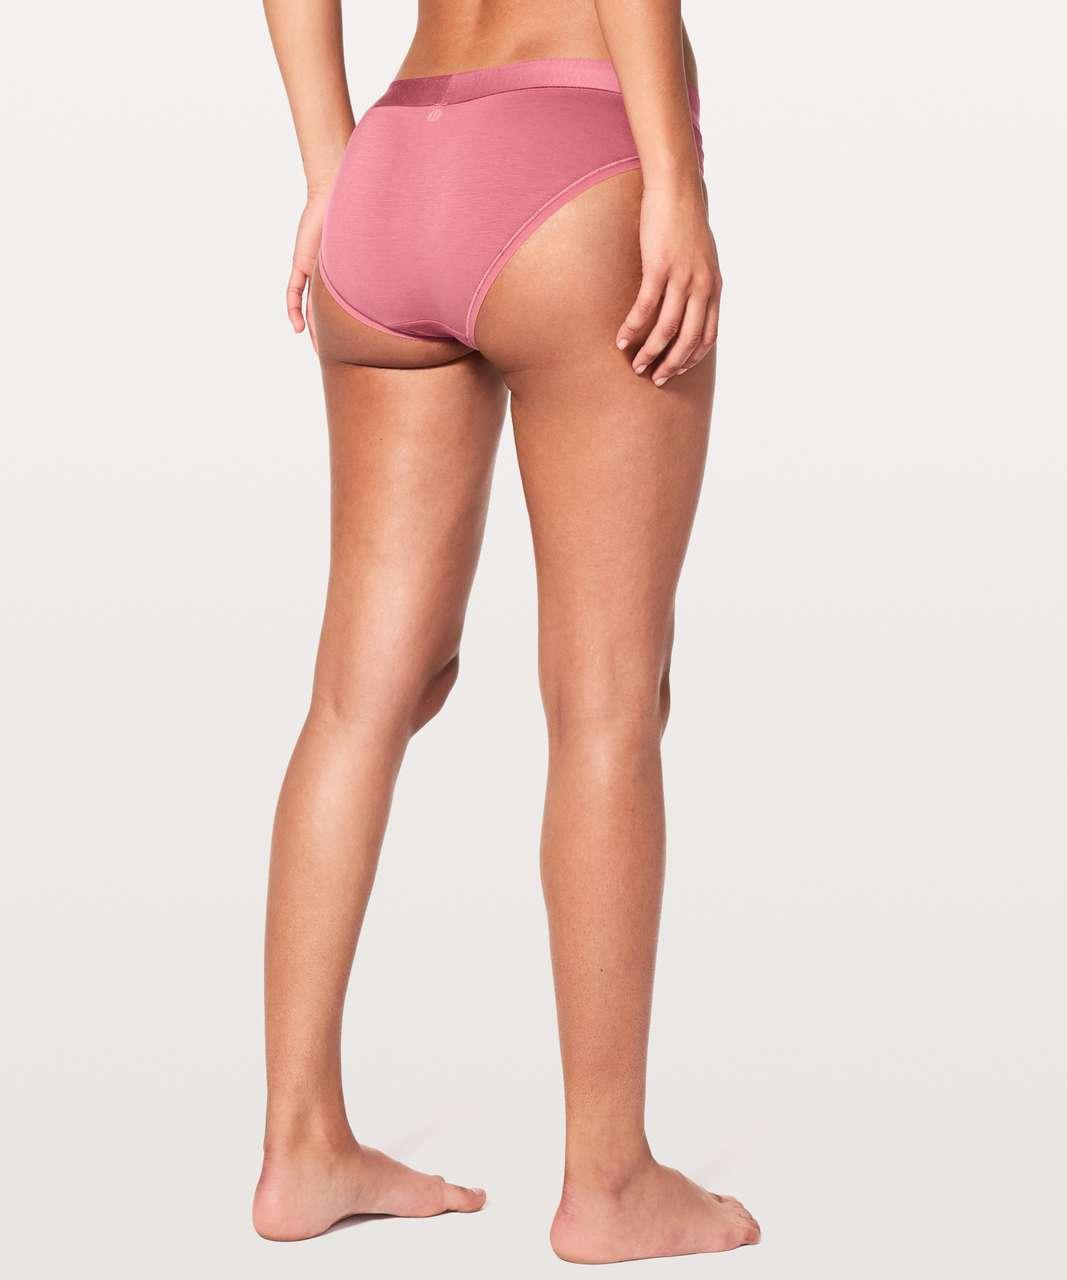 Lululemon Mula Bandhawear Bikini - Cherry Dust